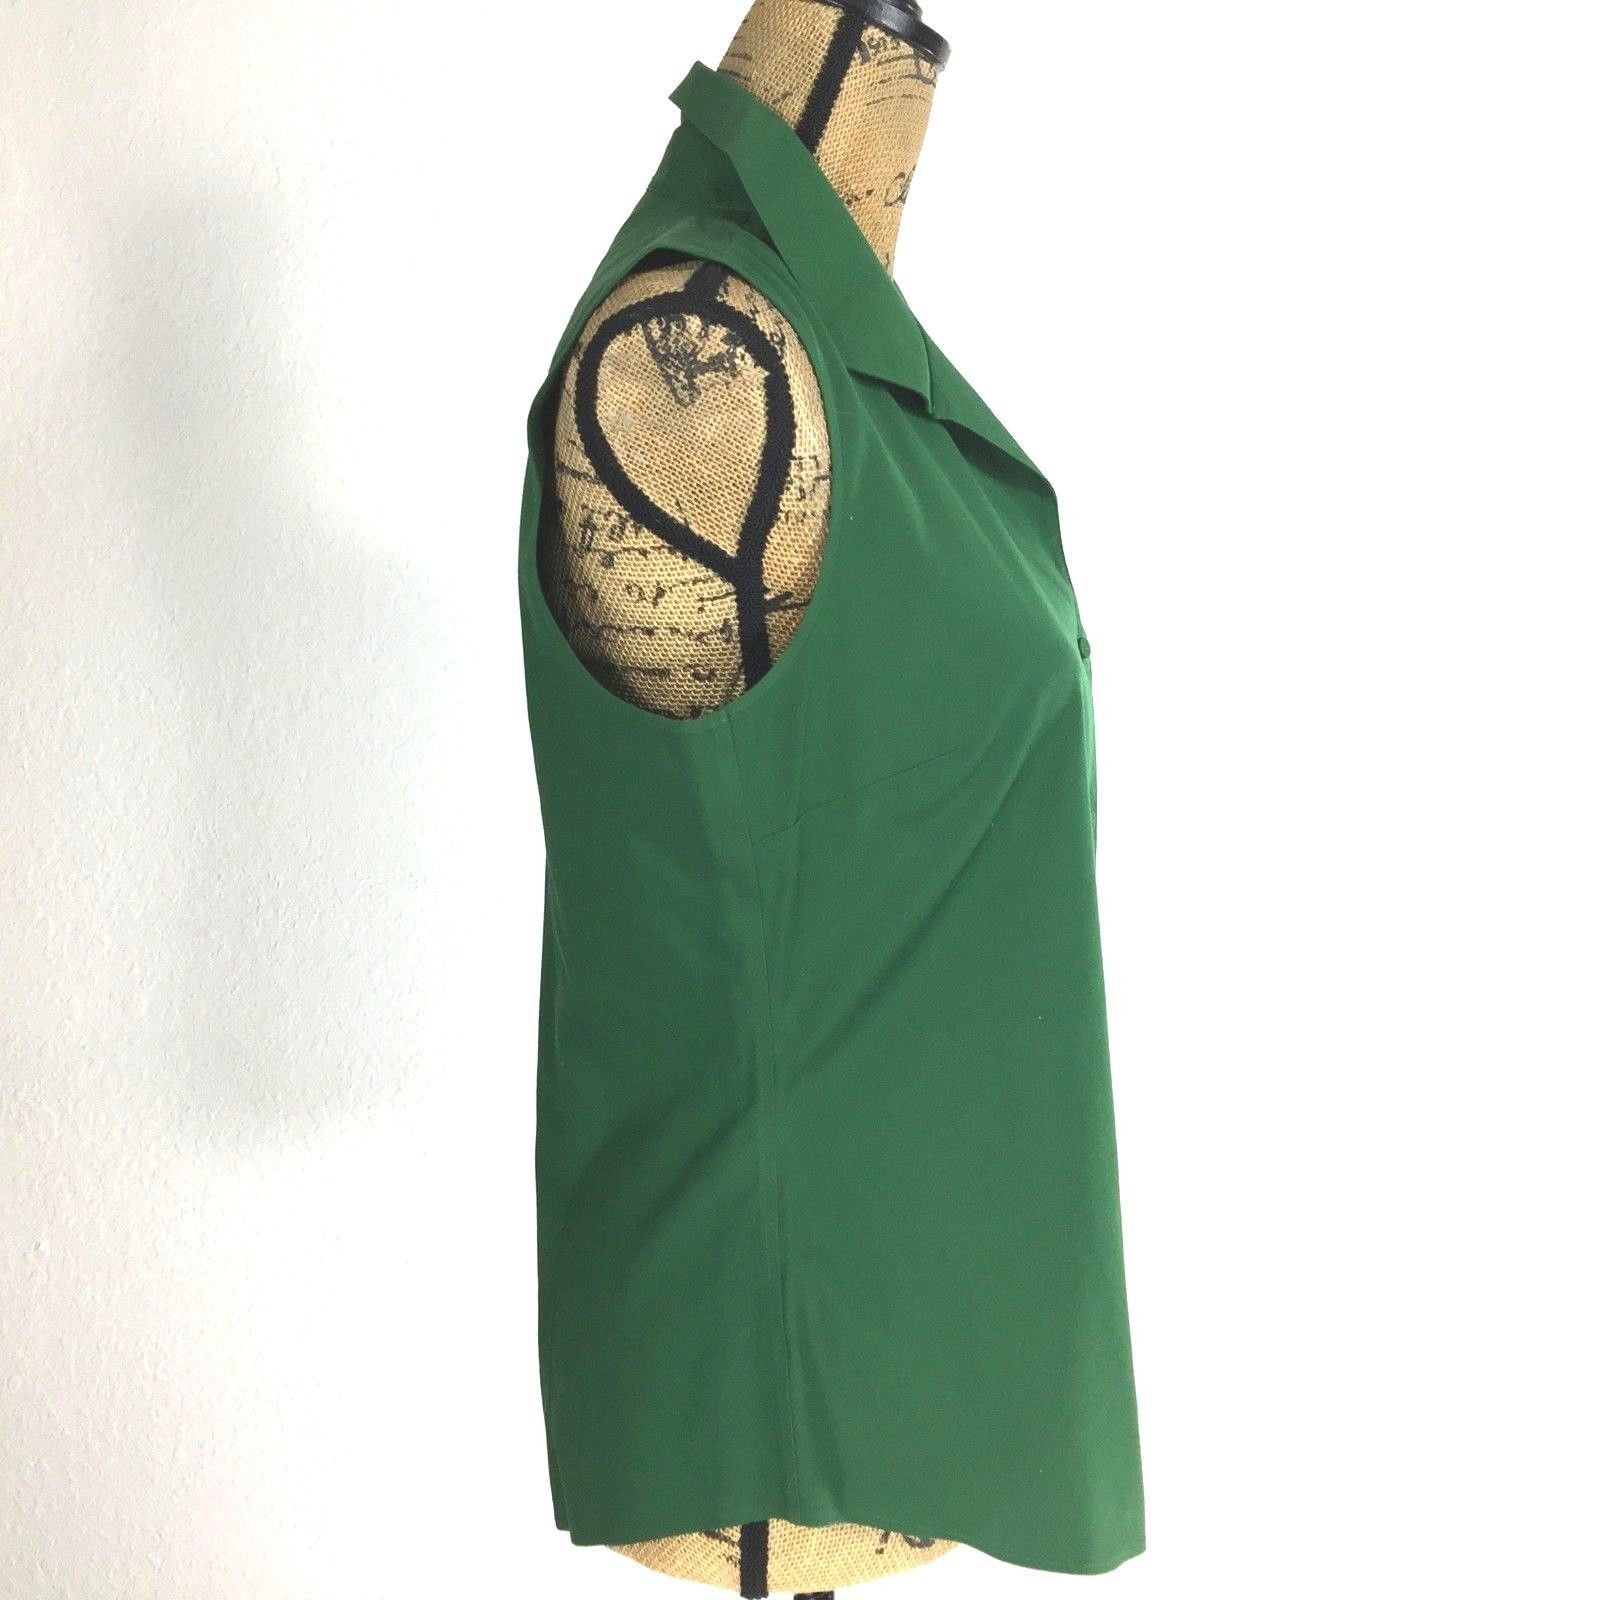 Talbots 8 Med M Shirt Wrinkle Resist Dark Green Collar Sleeveless Top Career LN